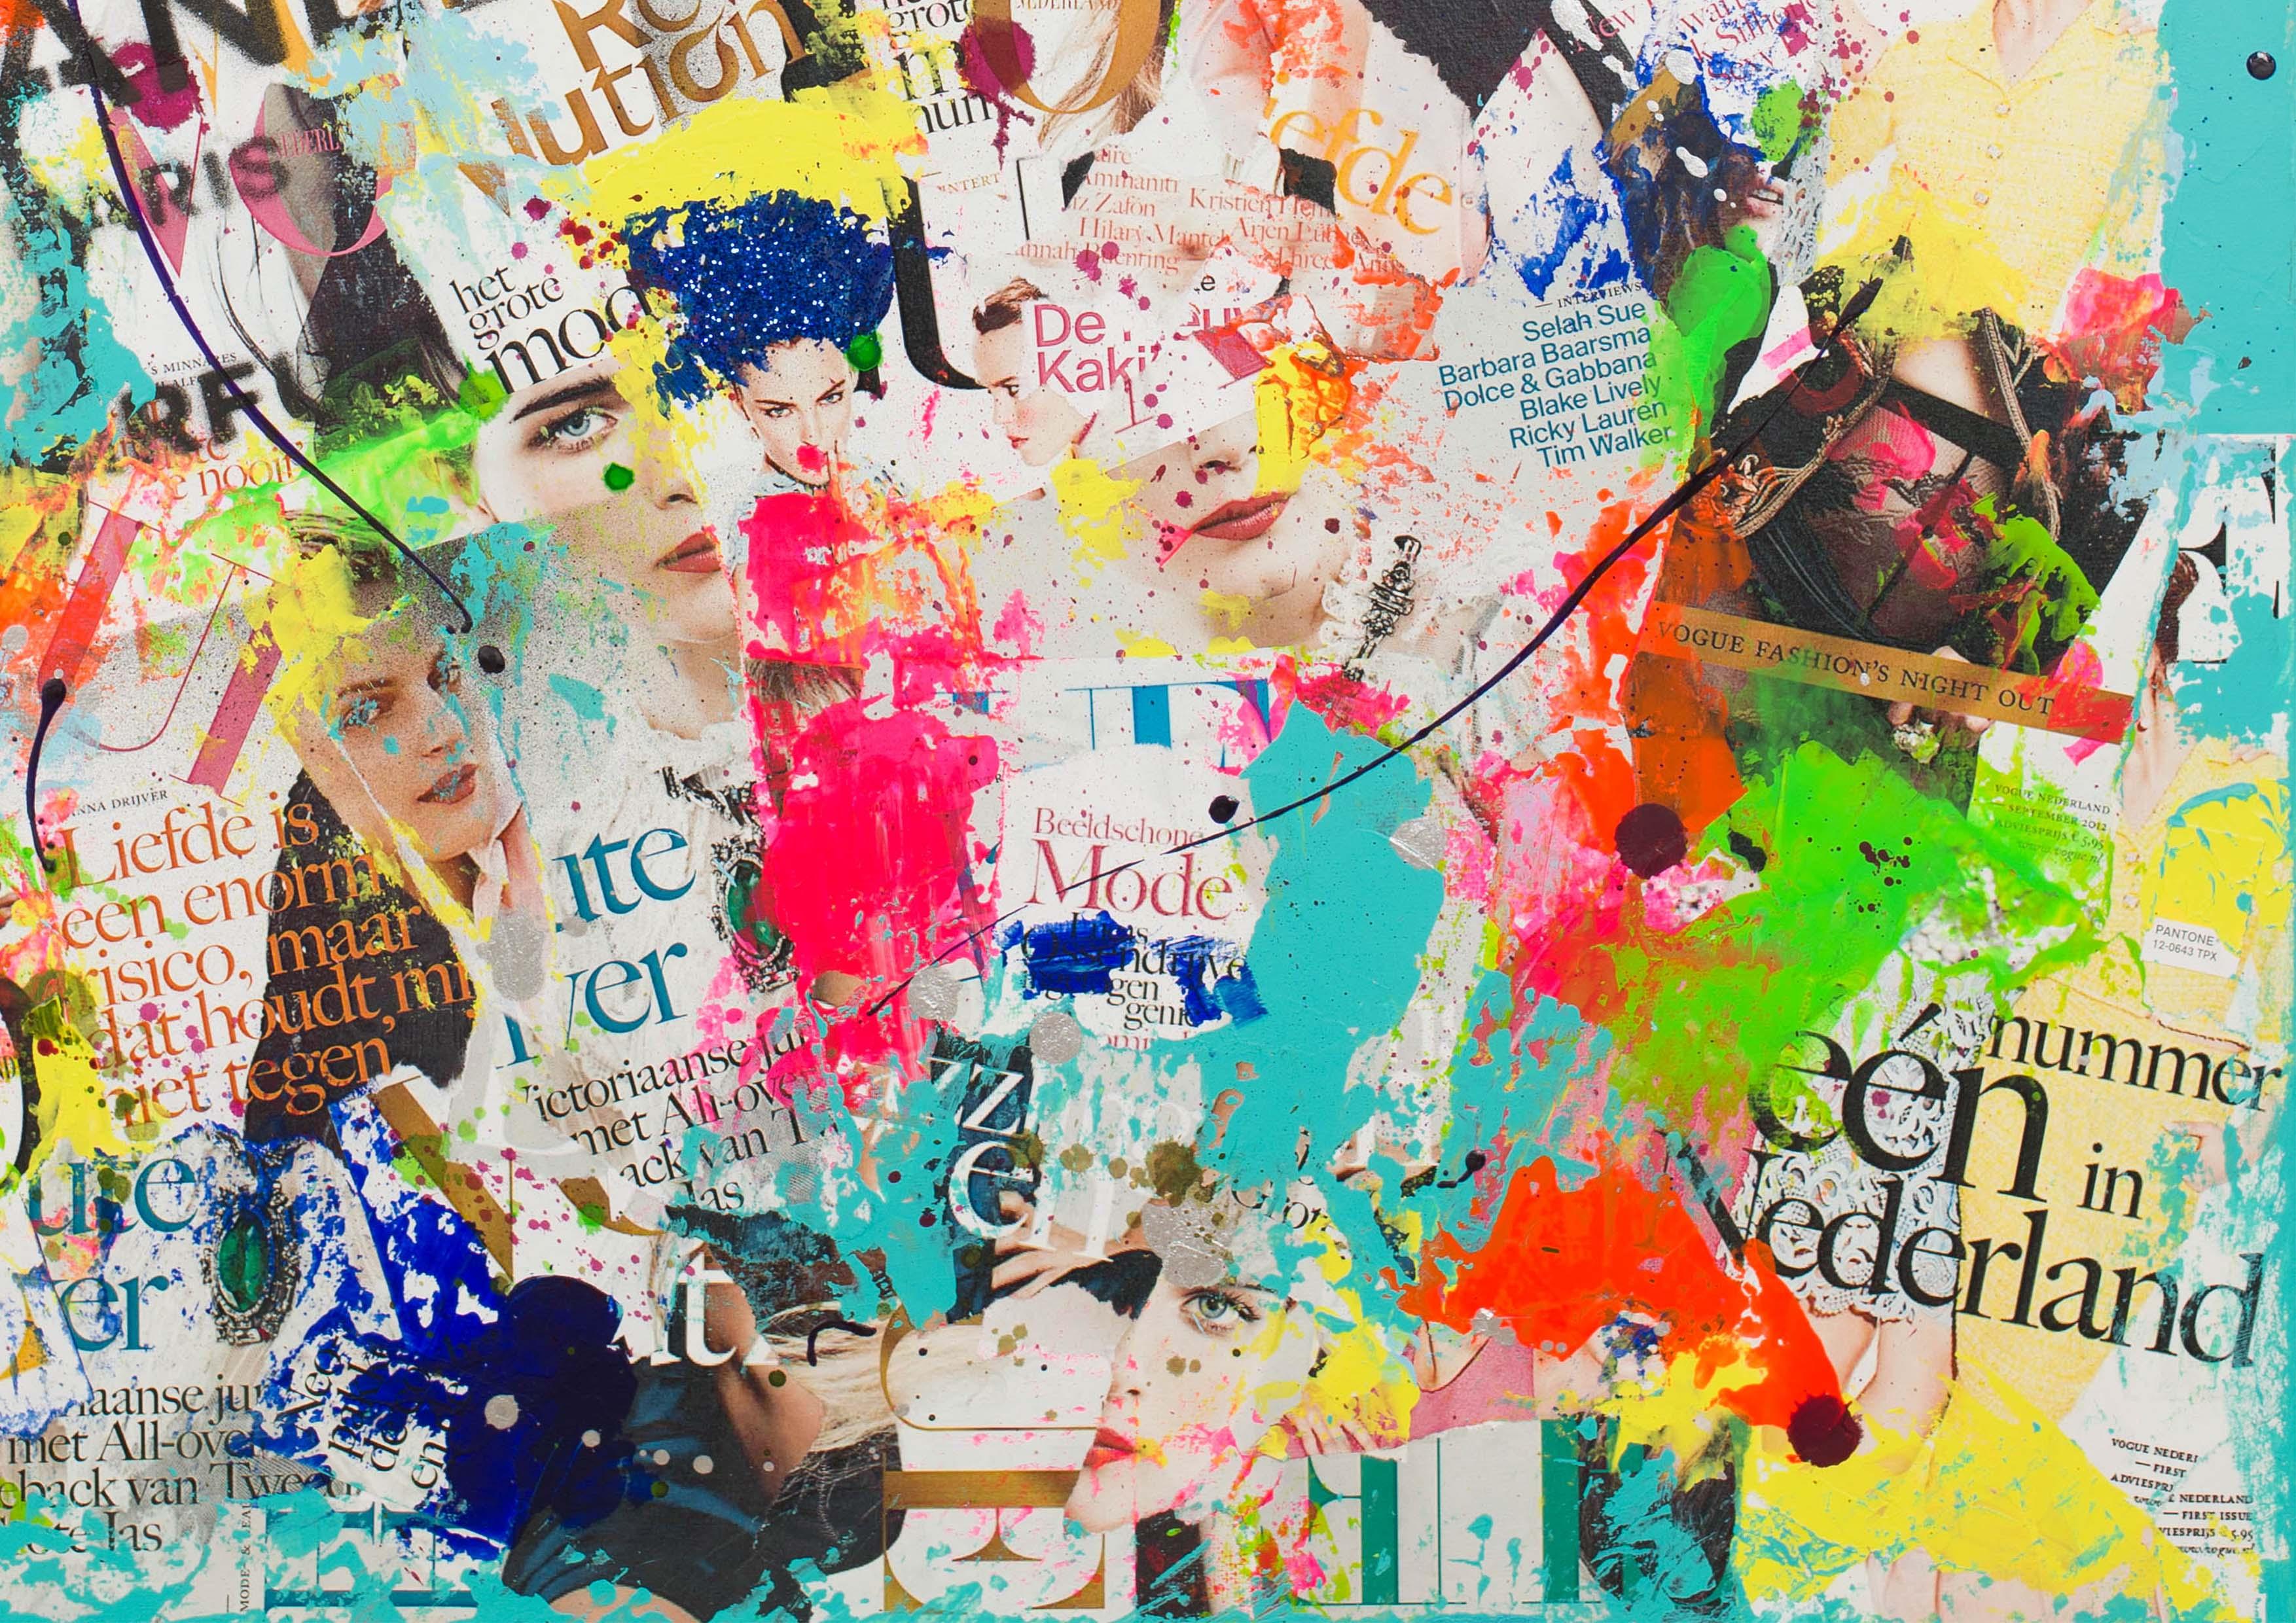 ART_MIXED-MEDIA_NEONIC_REVOLUTION_CANVAS_DETAIL_2